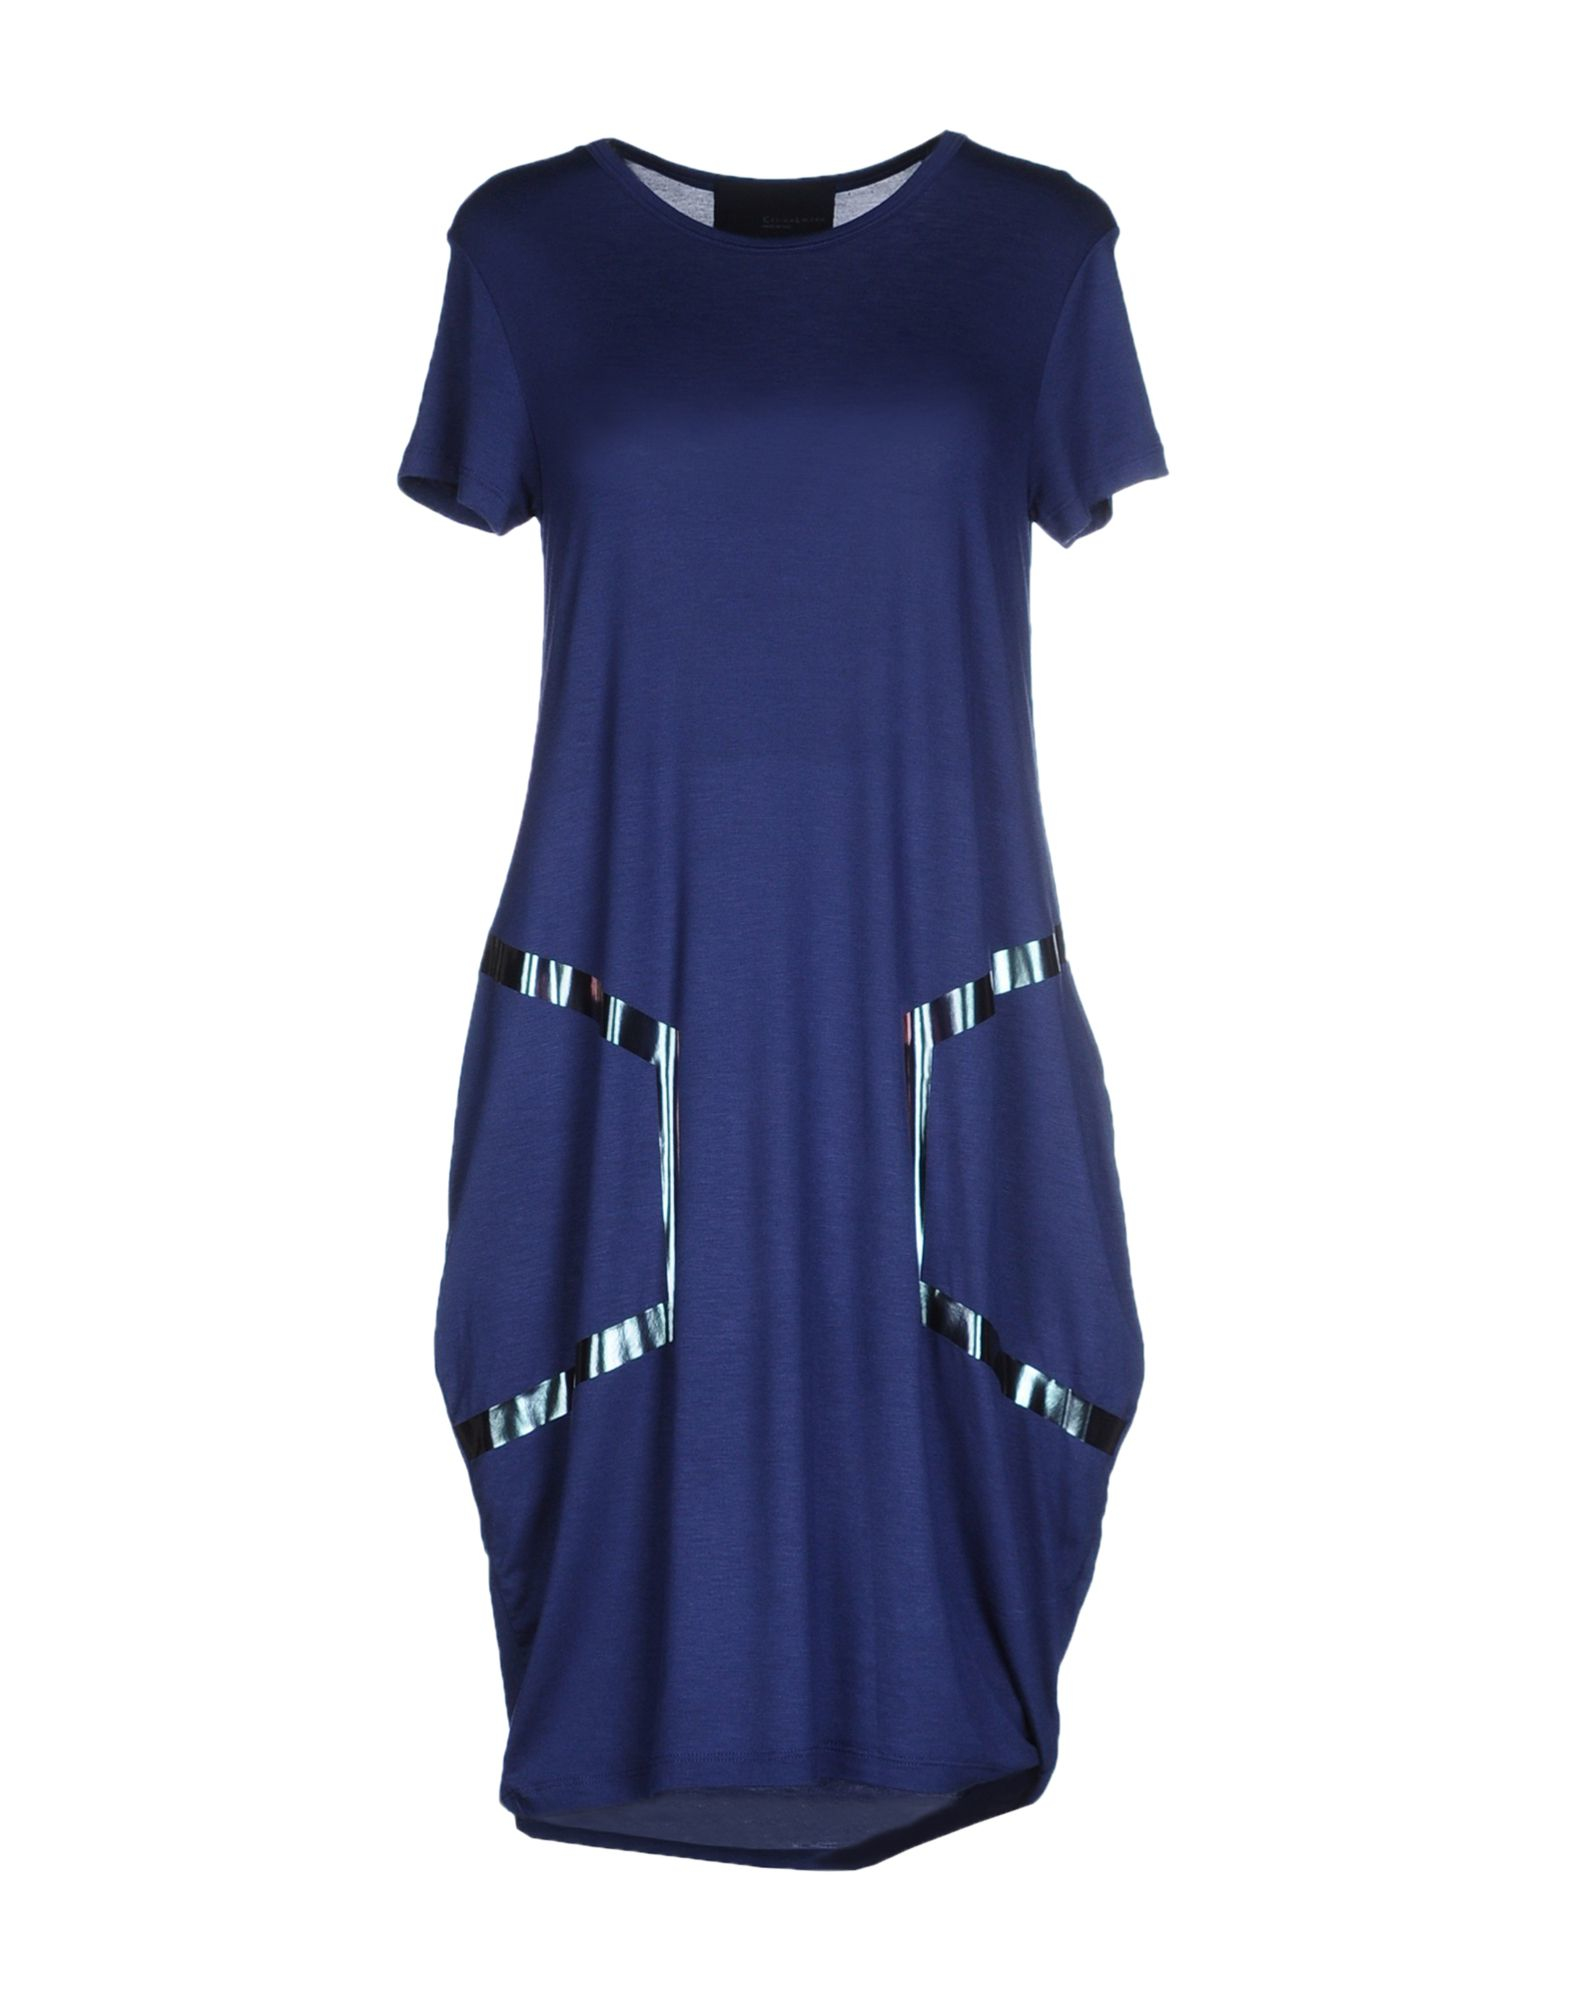 DRESSES - Short dresses Kai Aakmann cCJta4jZ